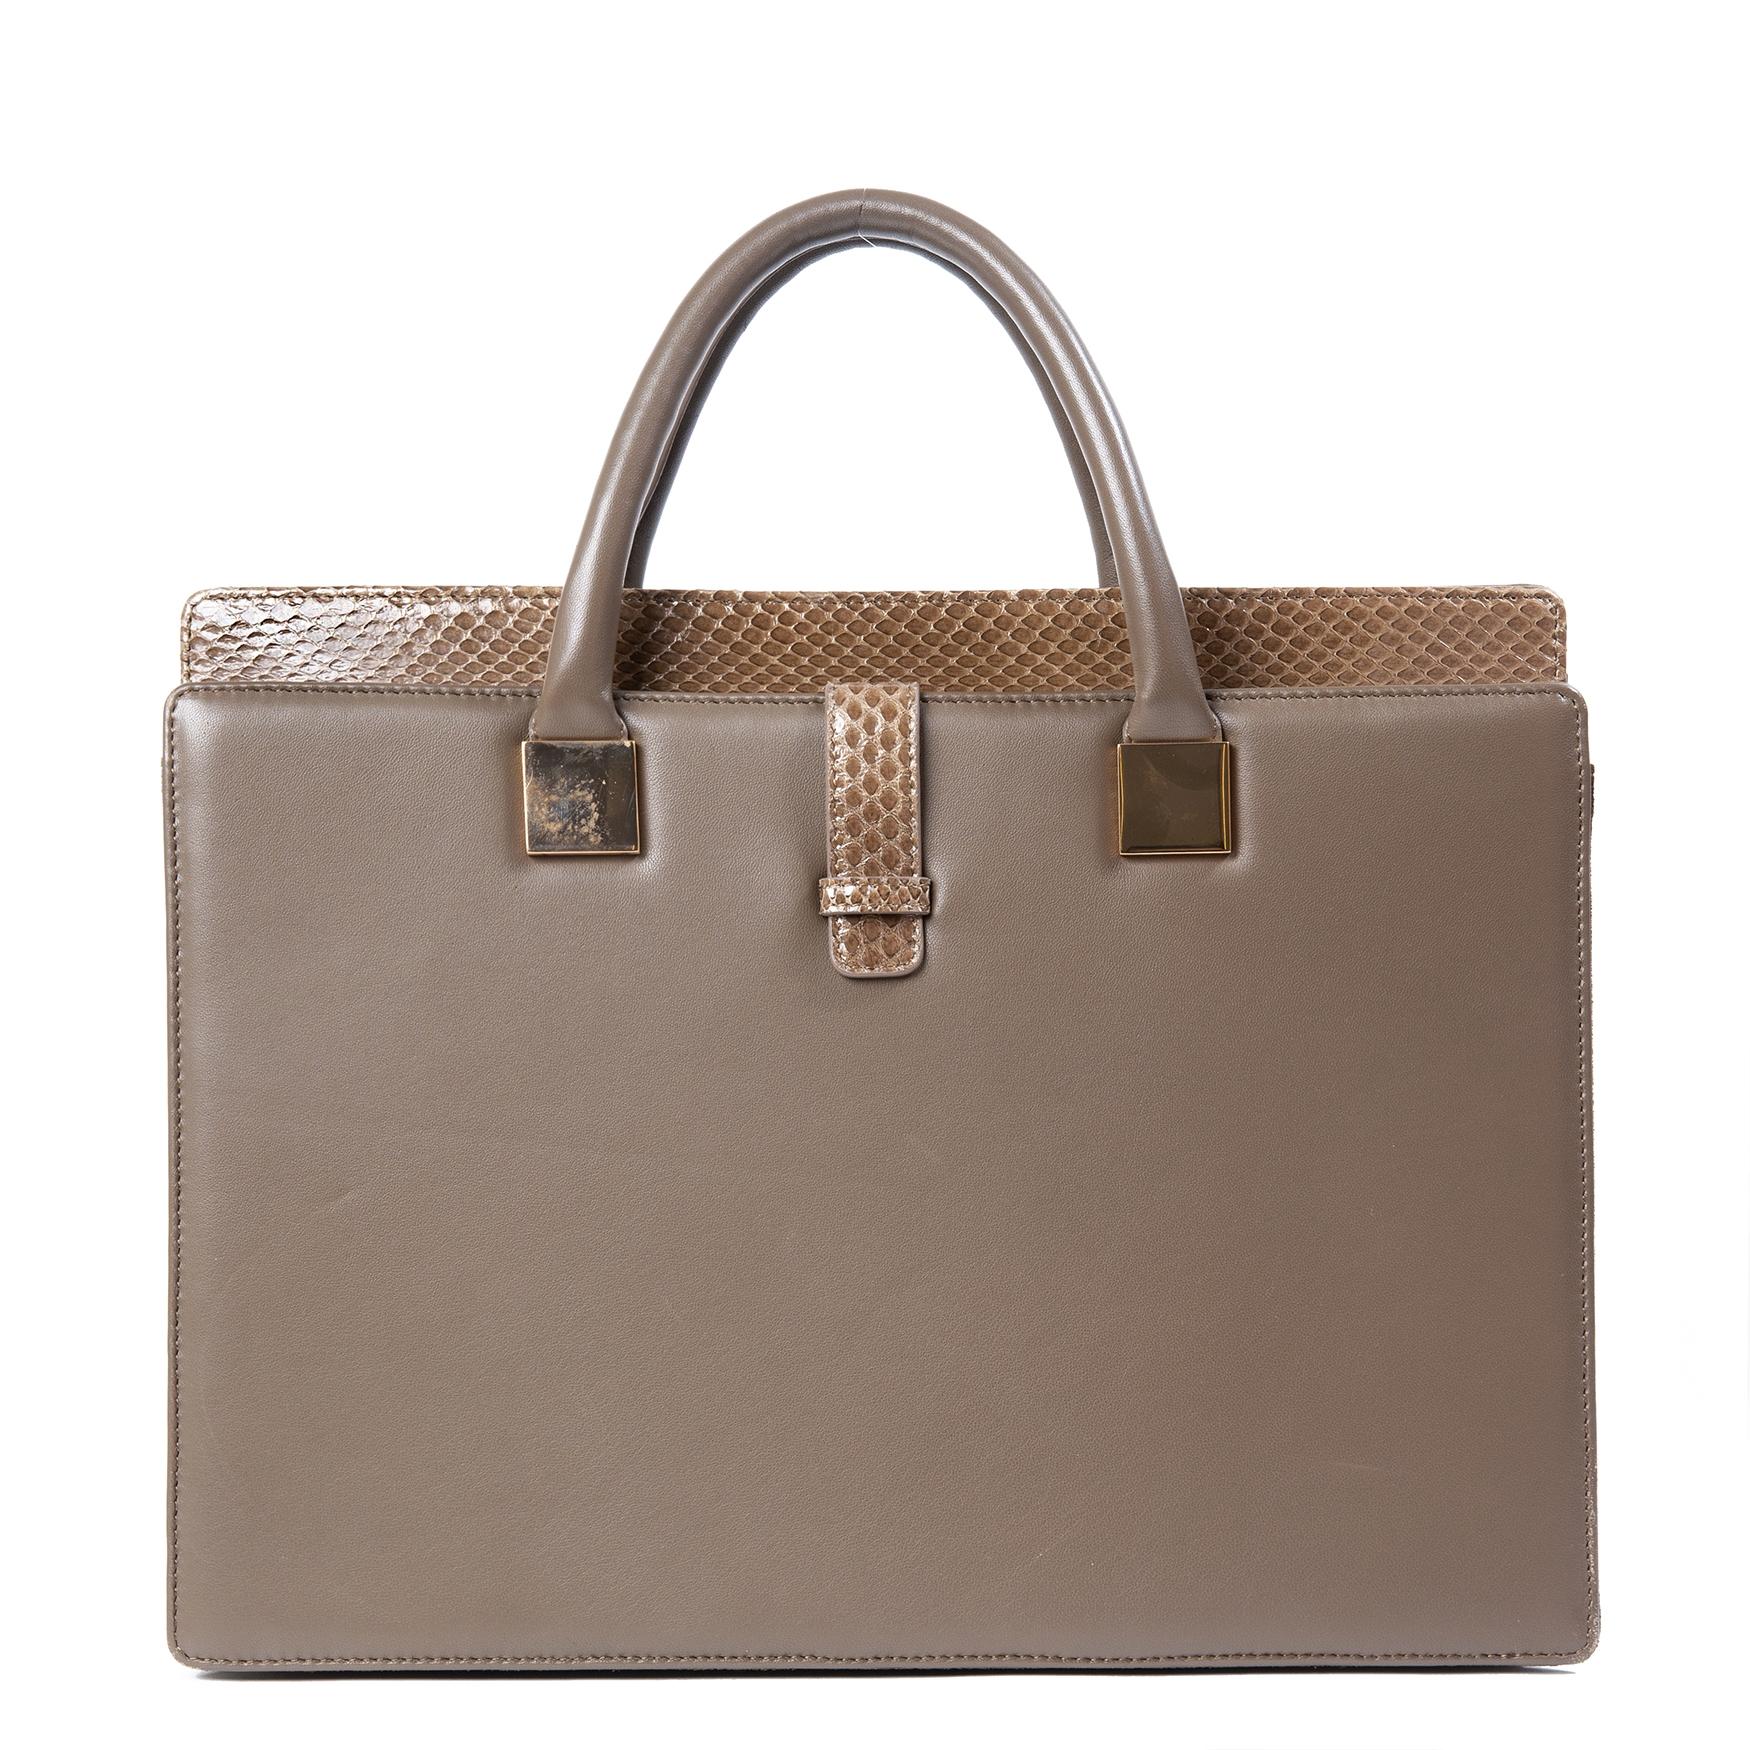 koop Linda Ferrow Grey Anniversary Ayers And Leather Briefcase bij labellov